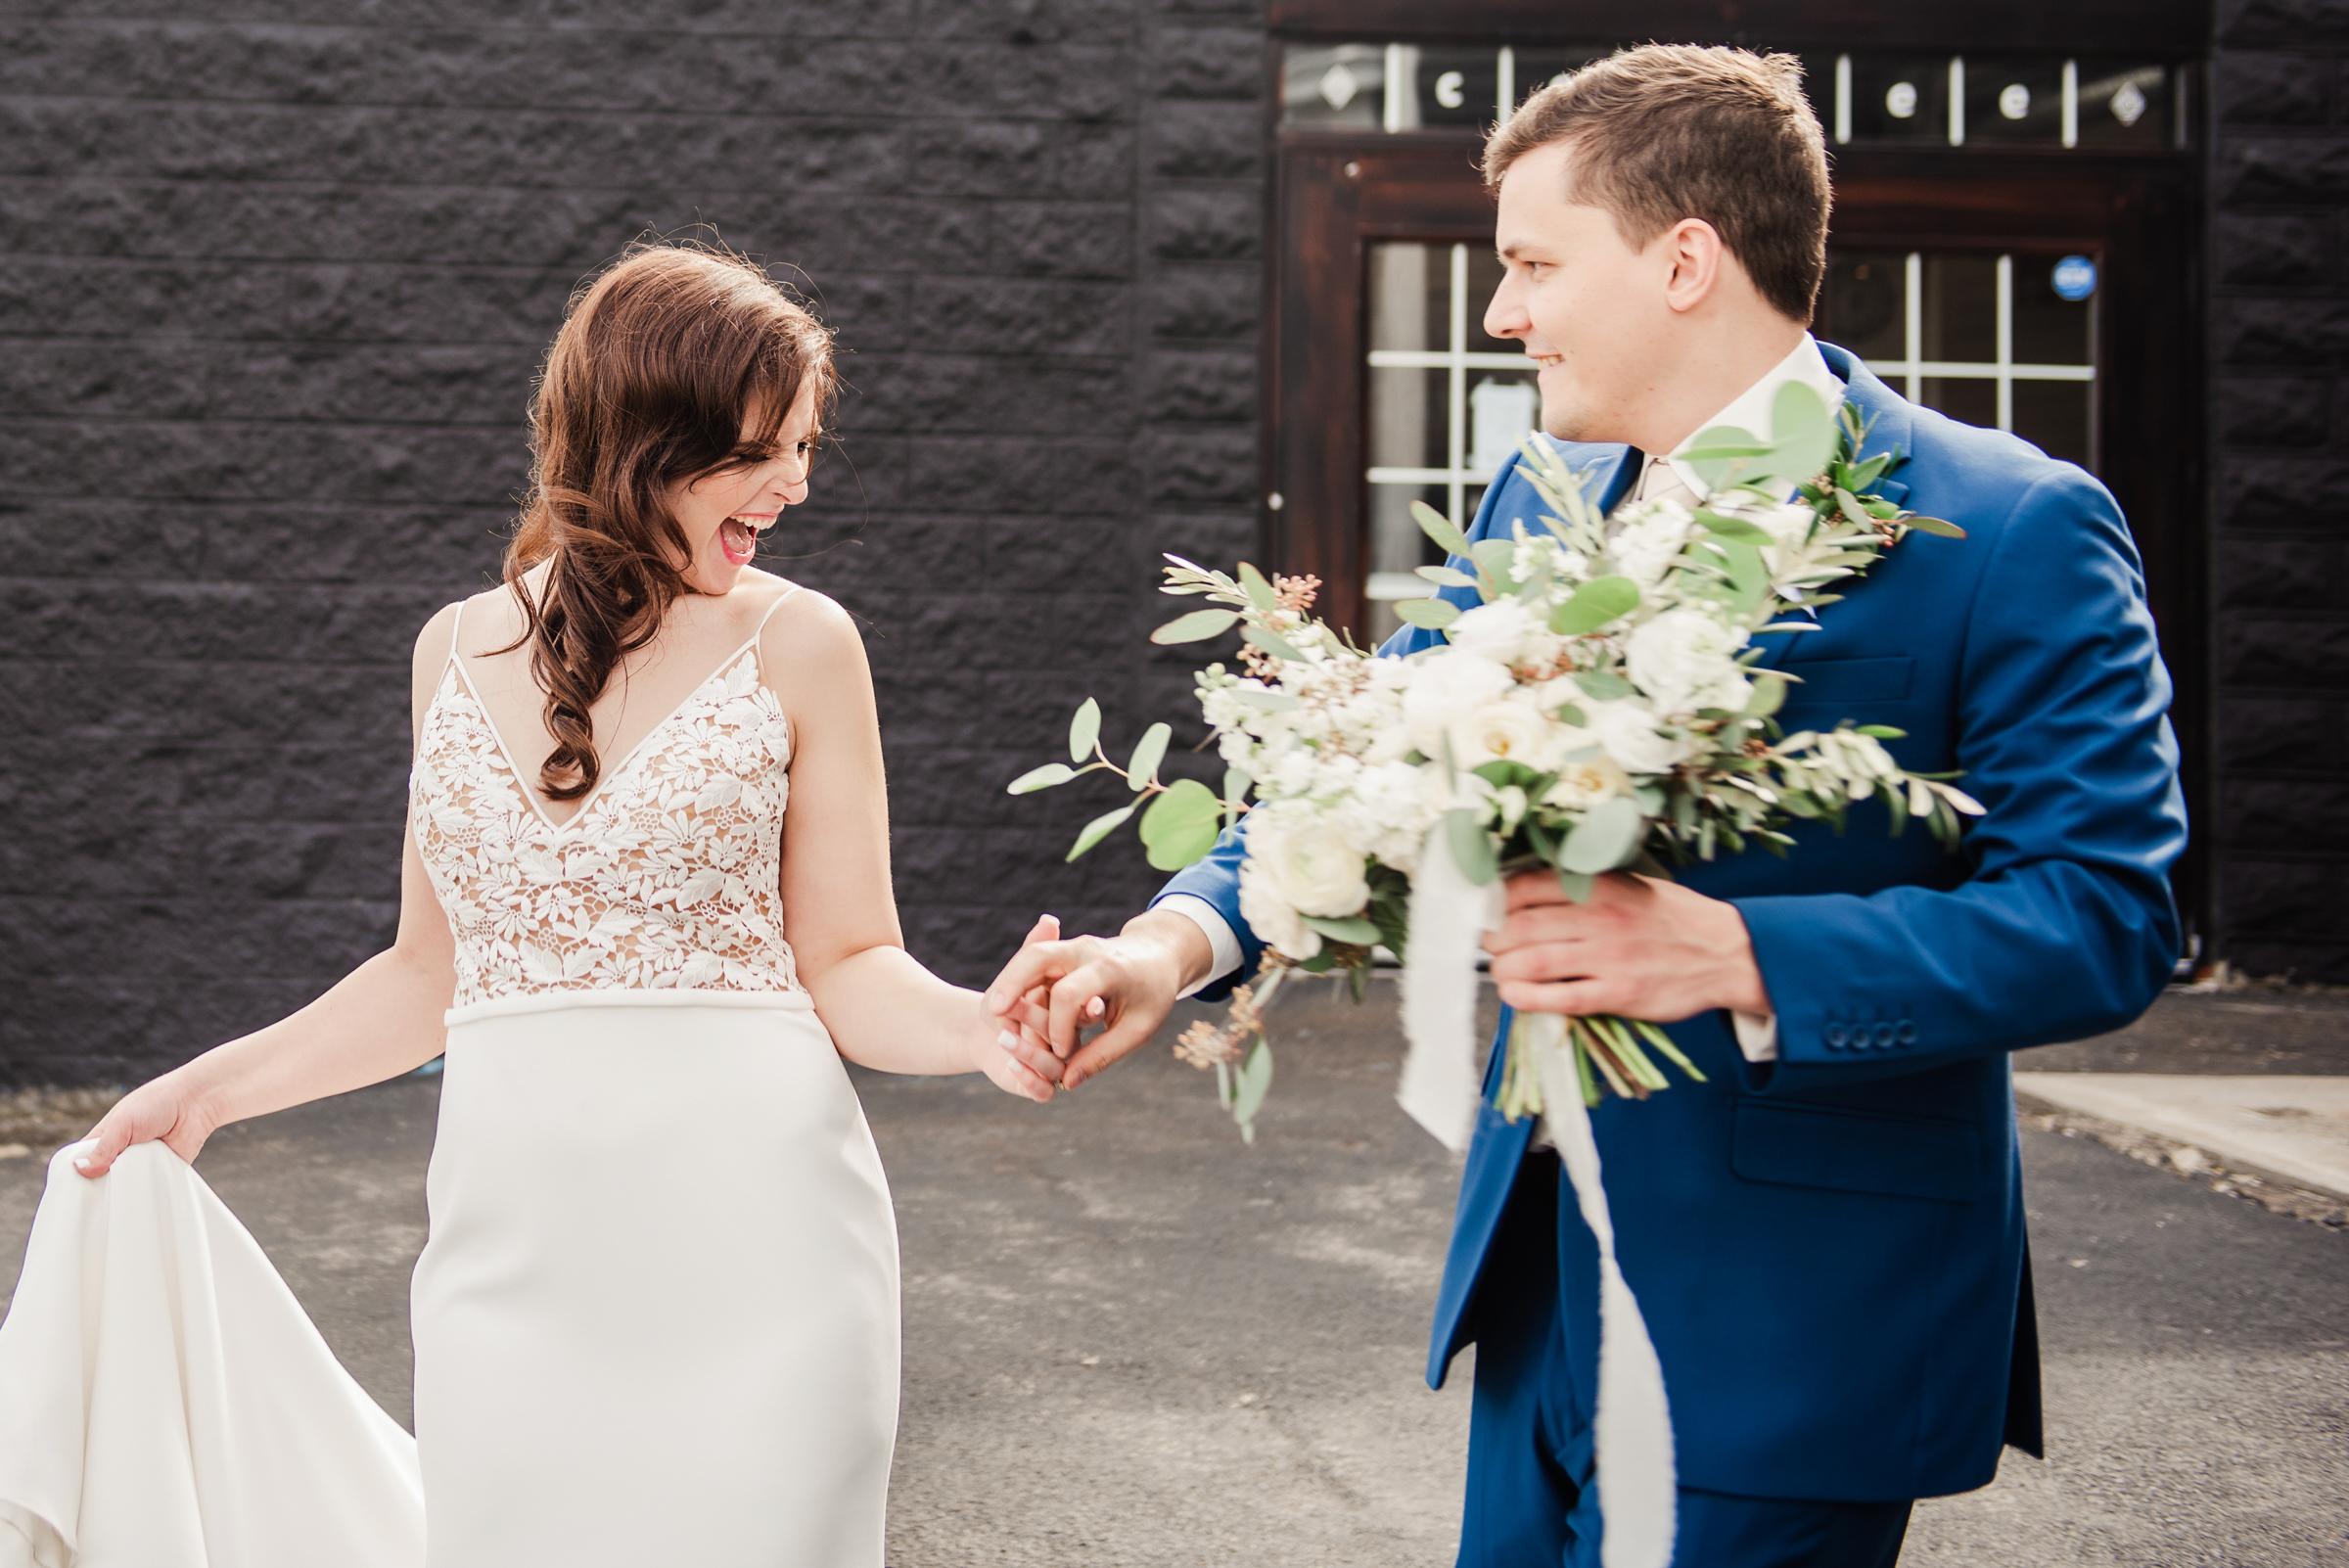 The_Arbor_LoftRochester_Wedding_JILL_STUDIO_Rochester_NY_Photographer_160502.jpg